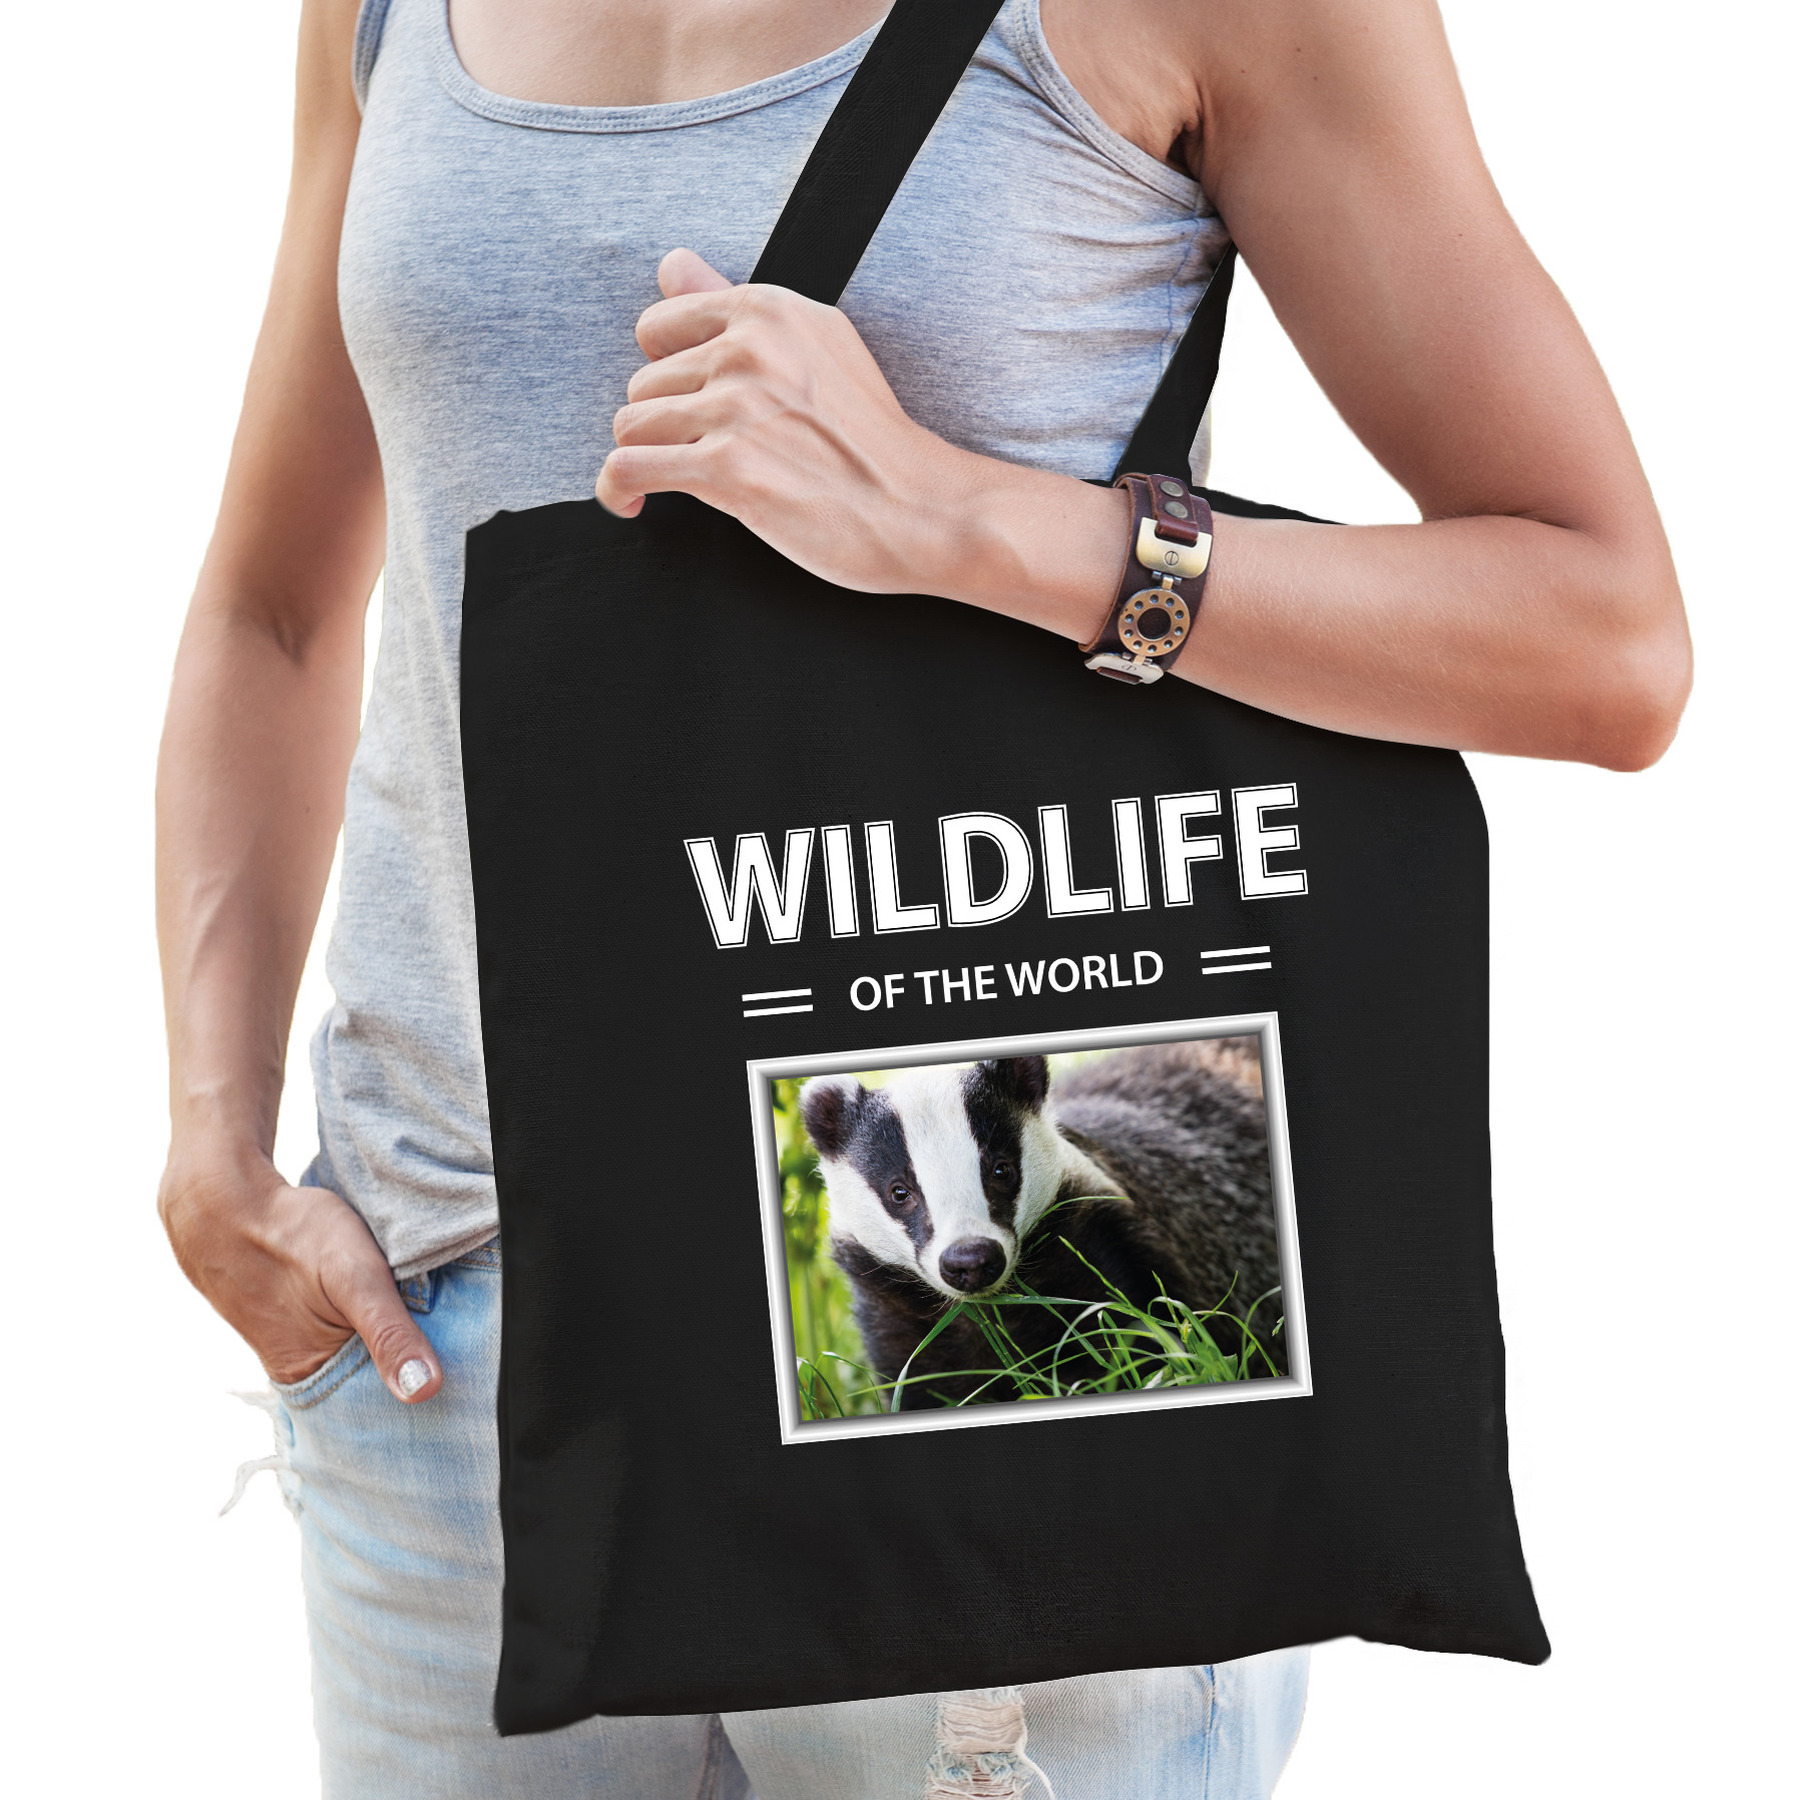 Katoenen tasje Dassen zwart - wildlife of the world Das cadeau tas